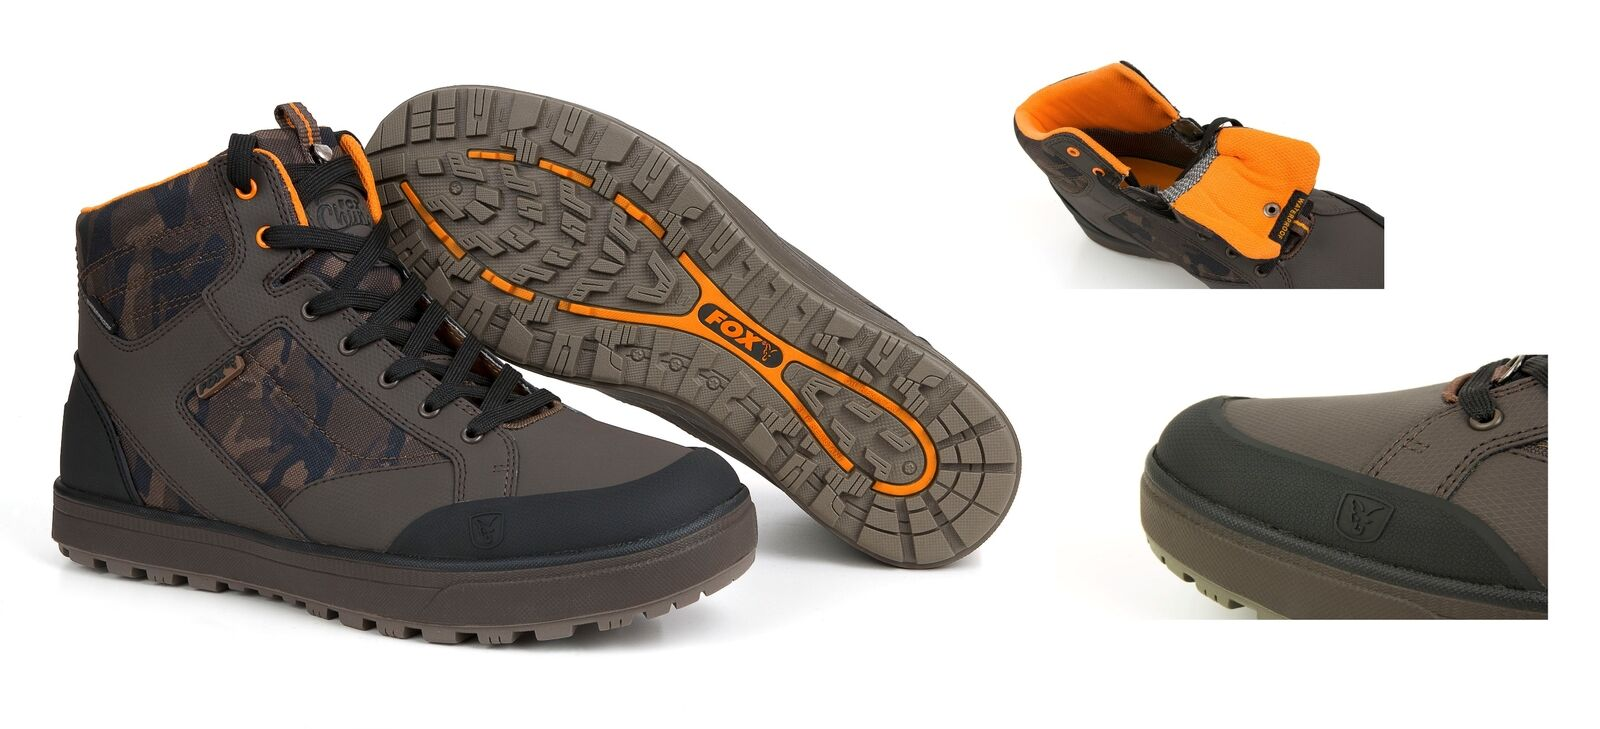 Fox Chunk Camo MID Boots Gr. 46 Wasserdicht Camouflage Stiefel Angelstiefel NEW